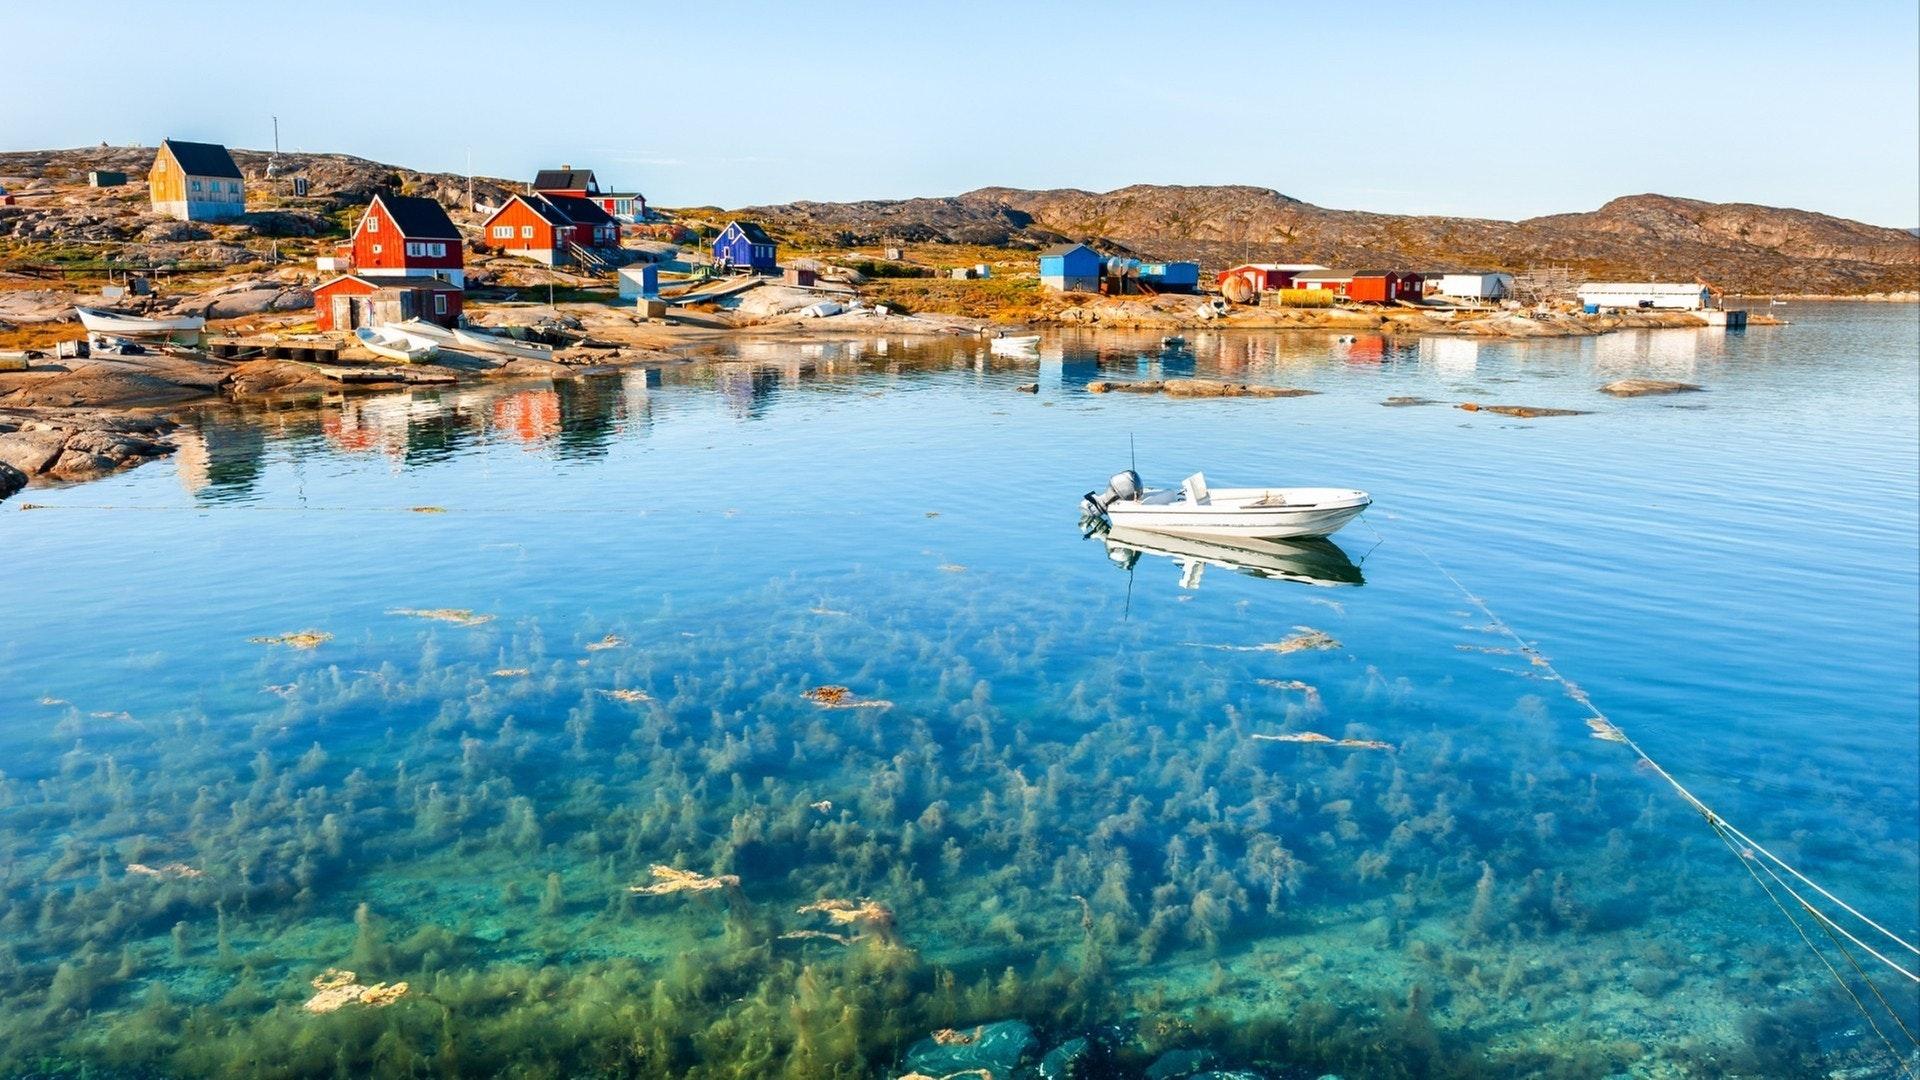 Beautiful sea coast and colourful houses on the rocks in Oqaatsut village